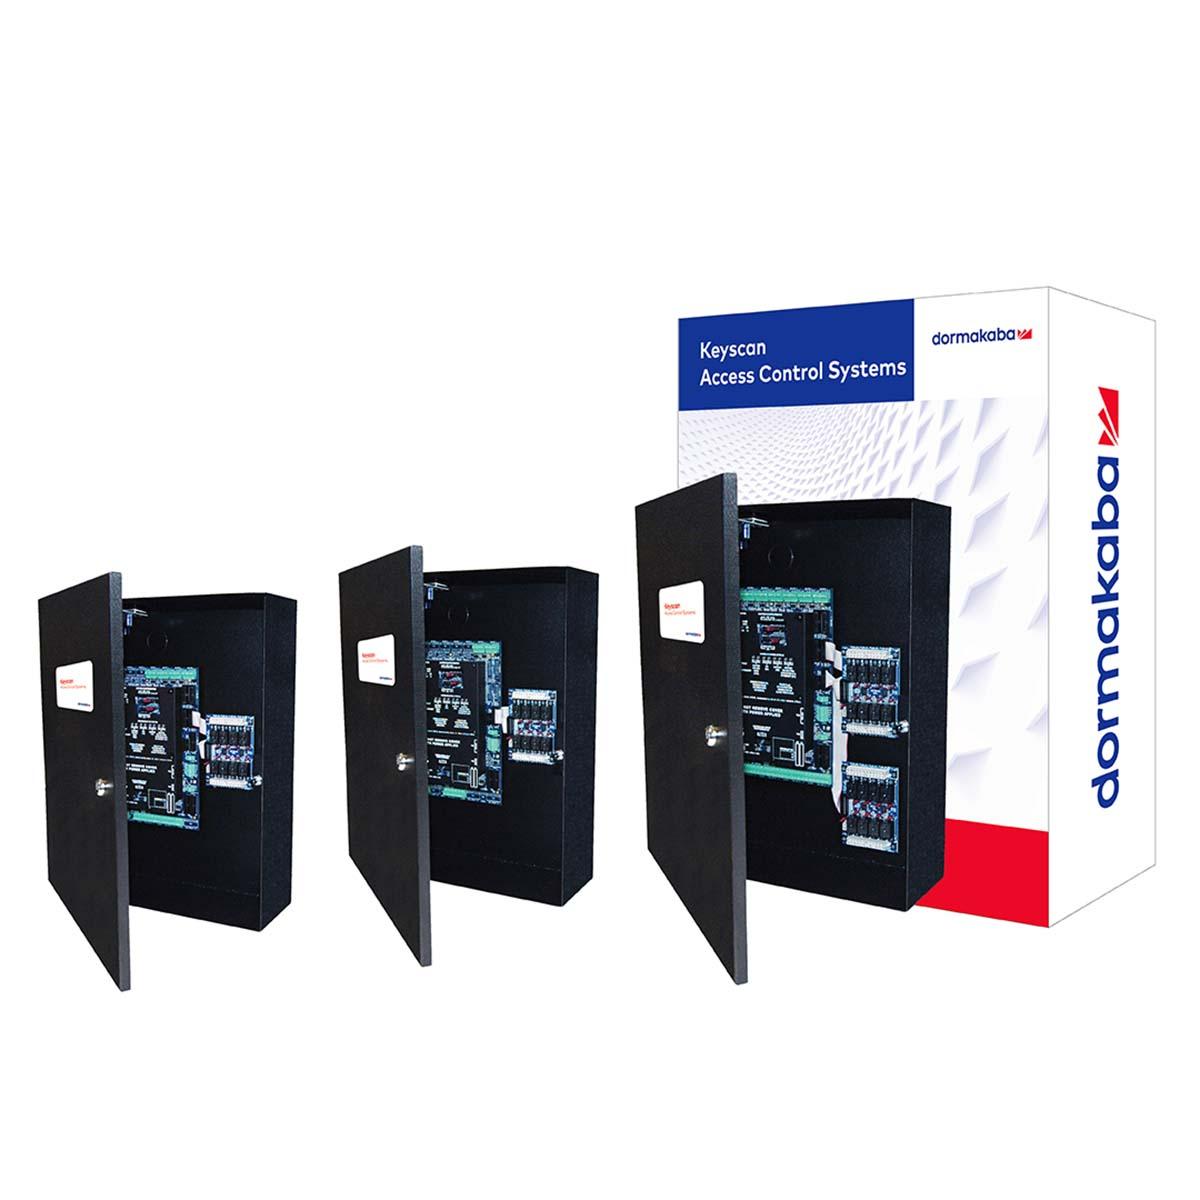 Rfid Access Control Wiring Diagram Tcpiprs485 Door Access Control